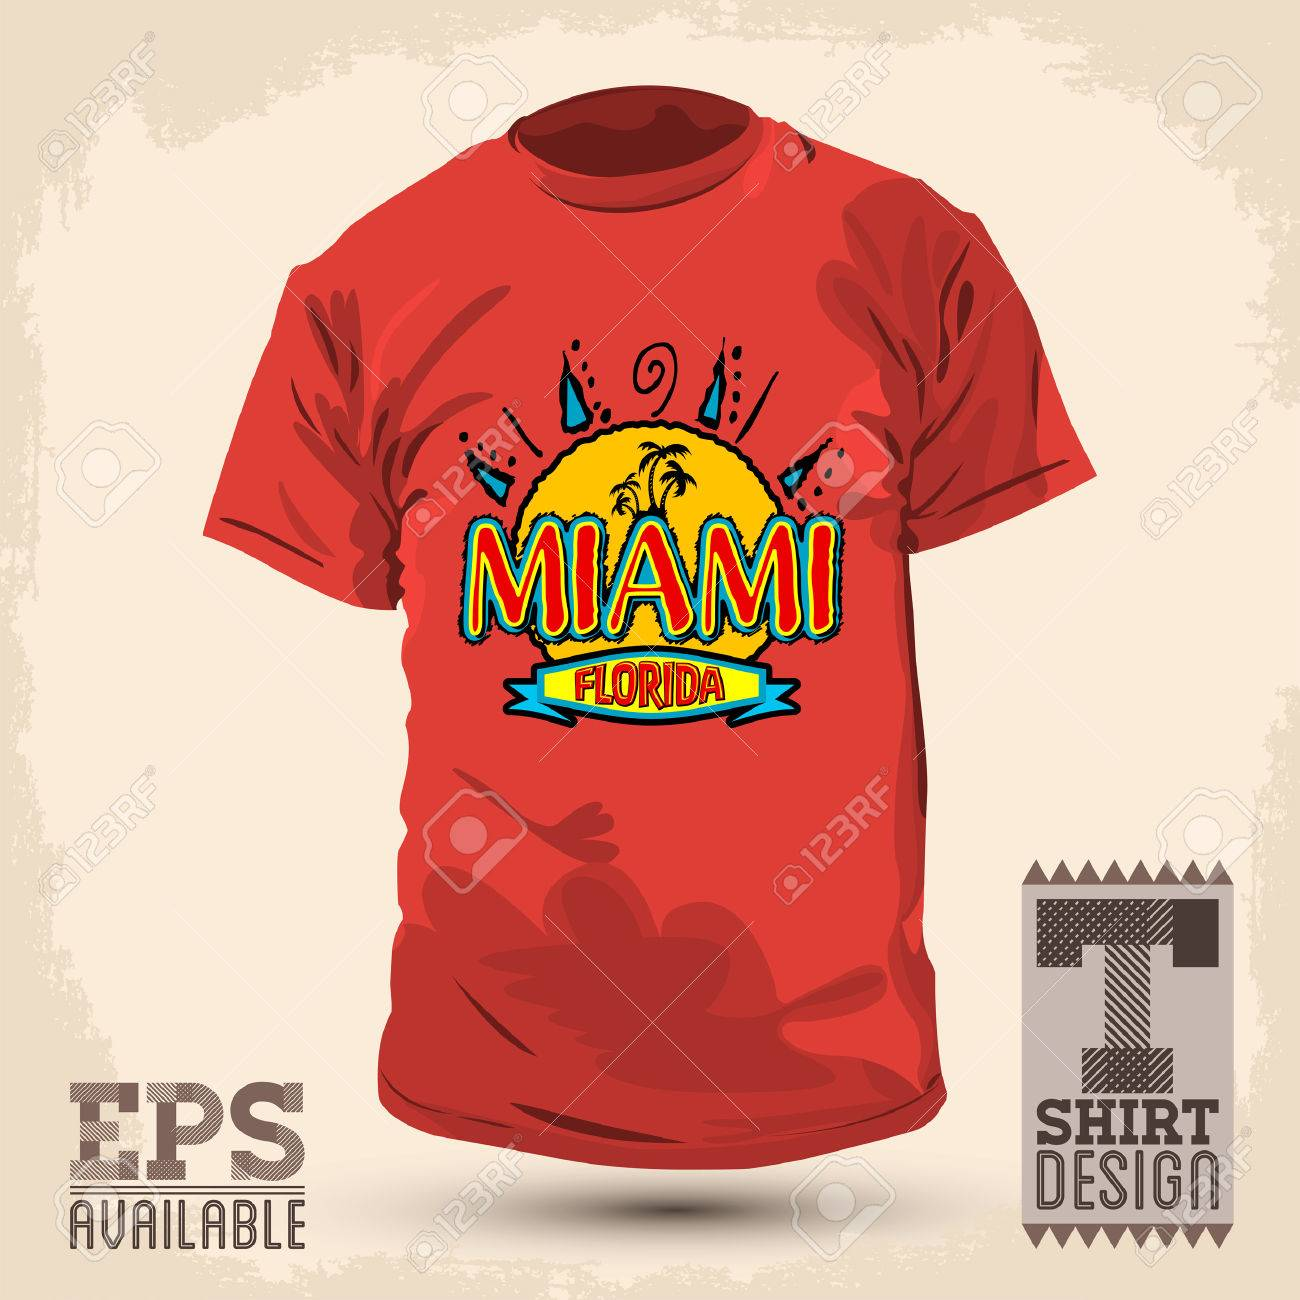 Graphic T Shirt Design Miami Florida Vector Illustration